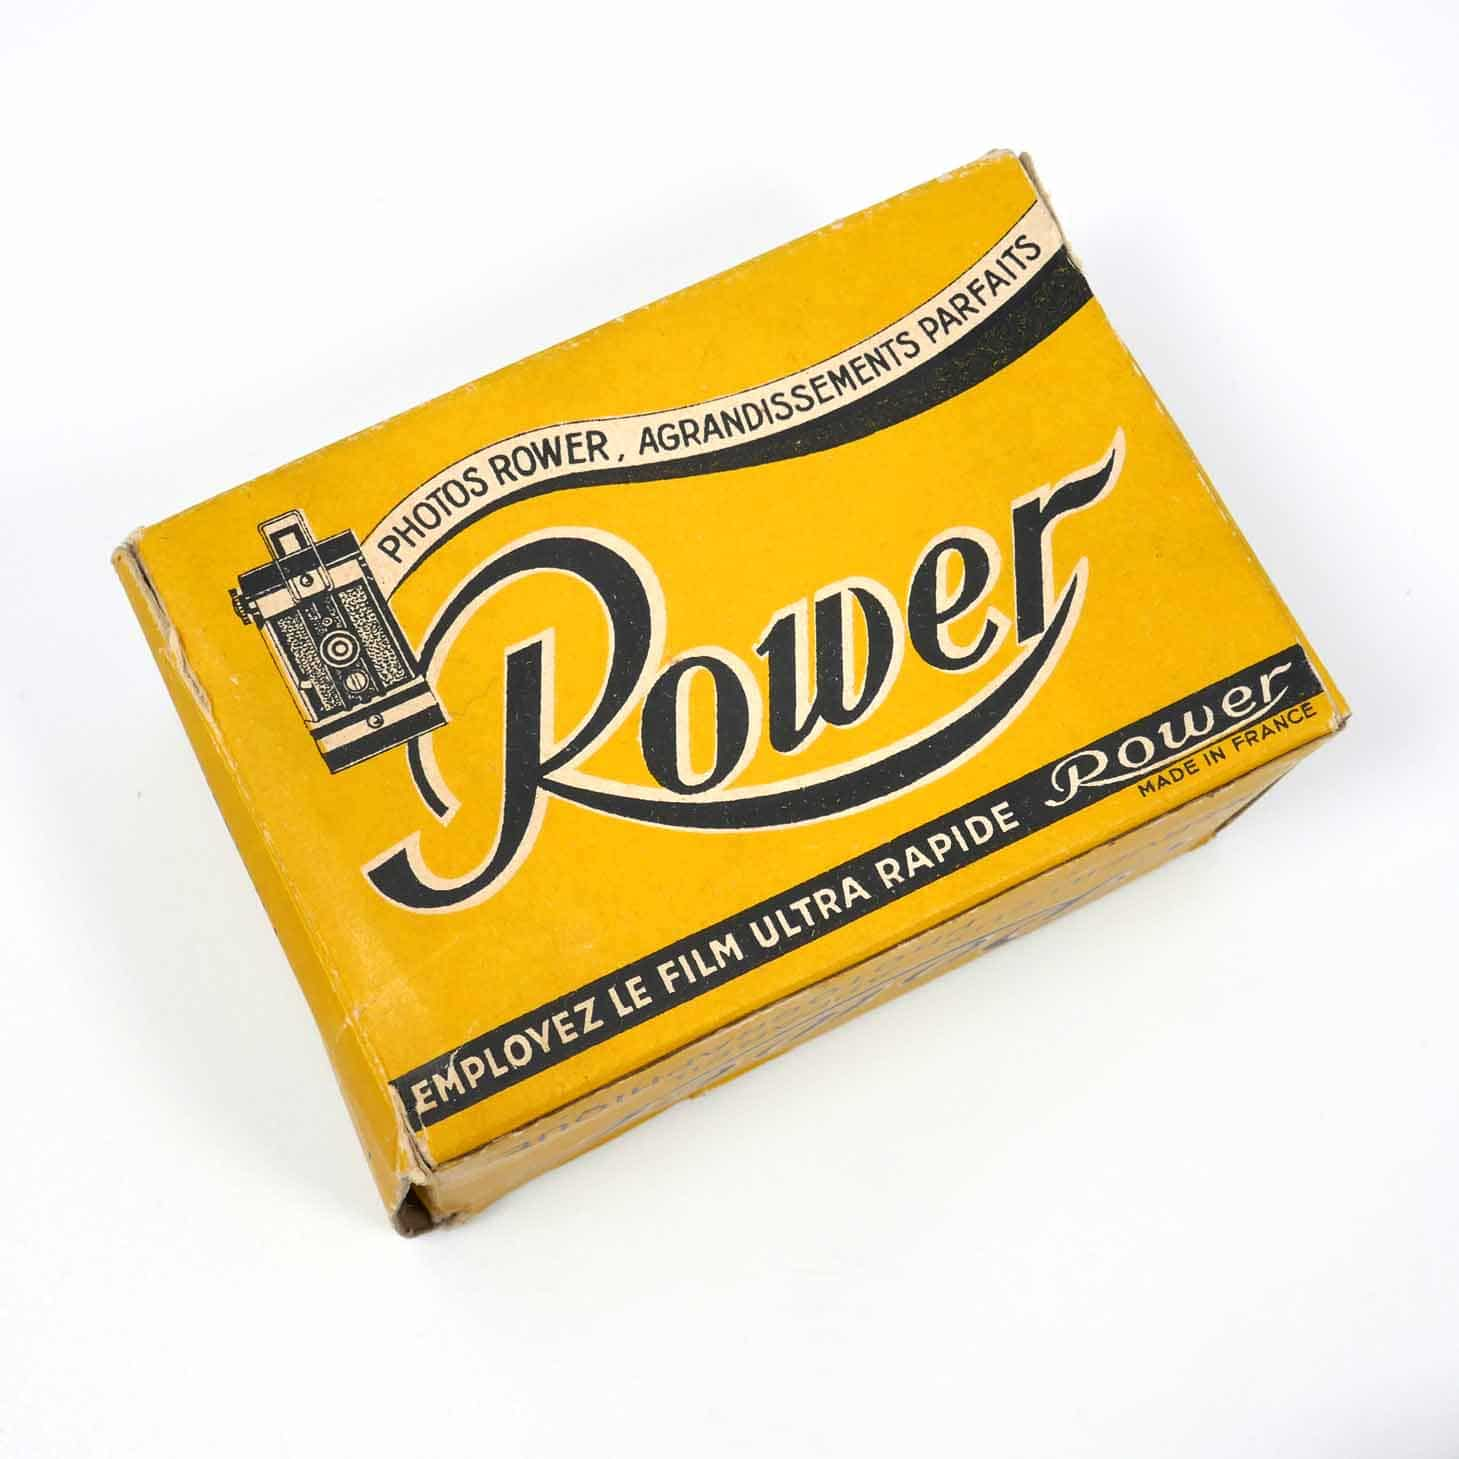 clean-cameras-Univex-A+Rower-01